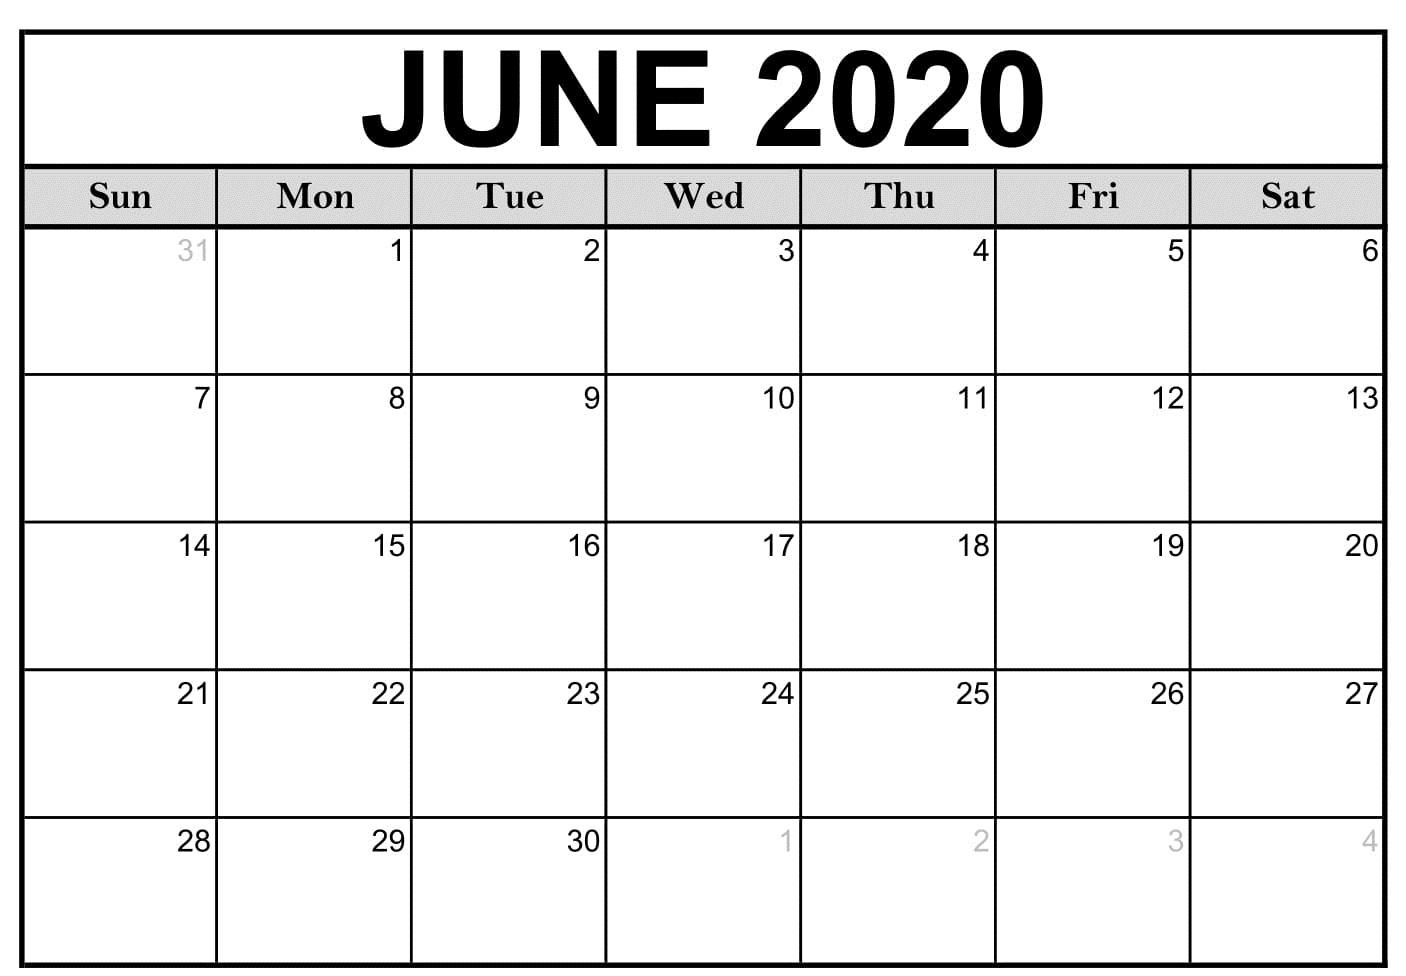 Monthly June 2020 Calendar Printable | Free Printable Calendar